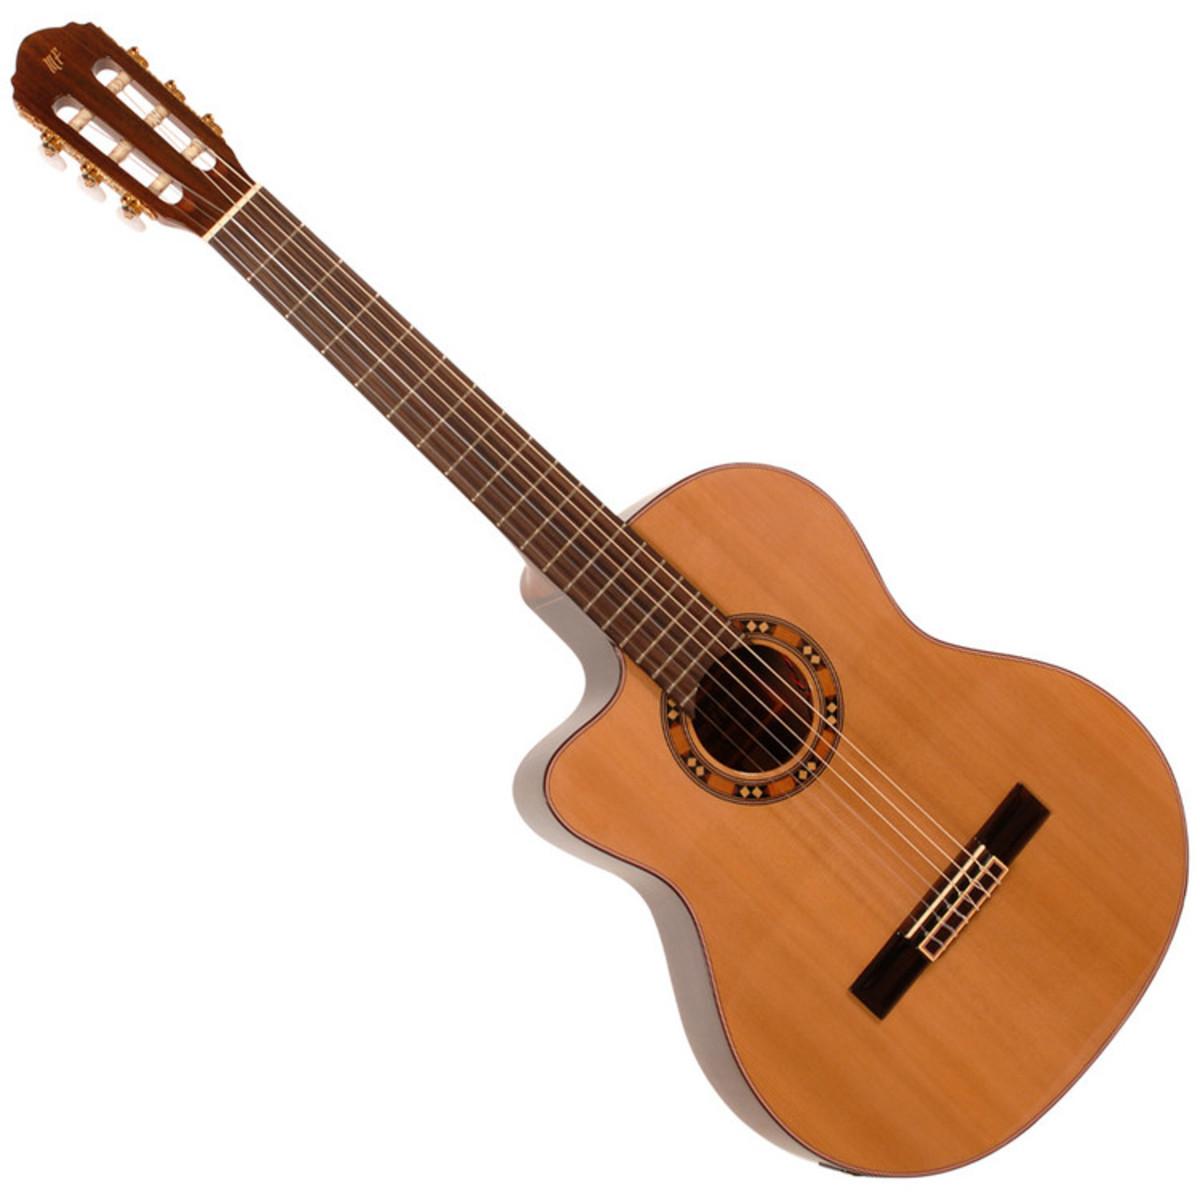 Yamaha Classical Guitar Left Handed